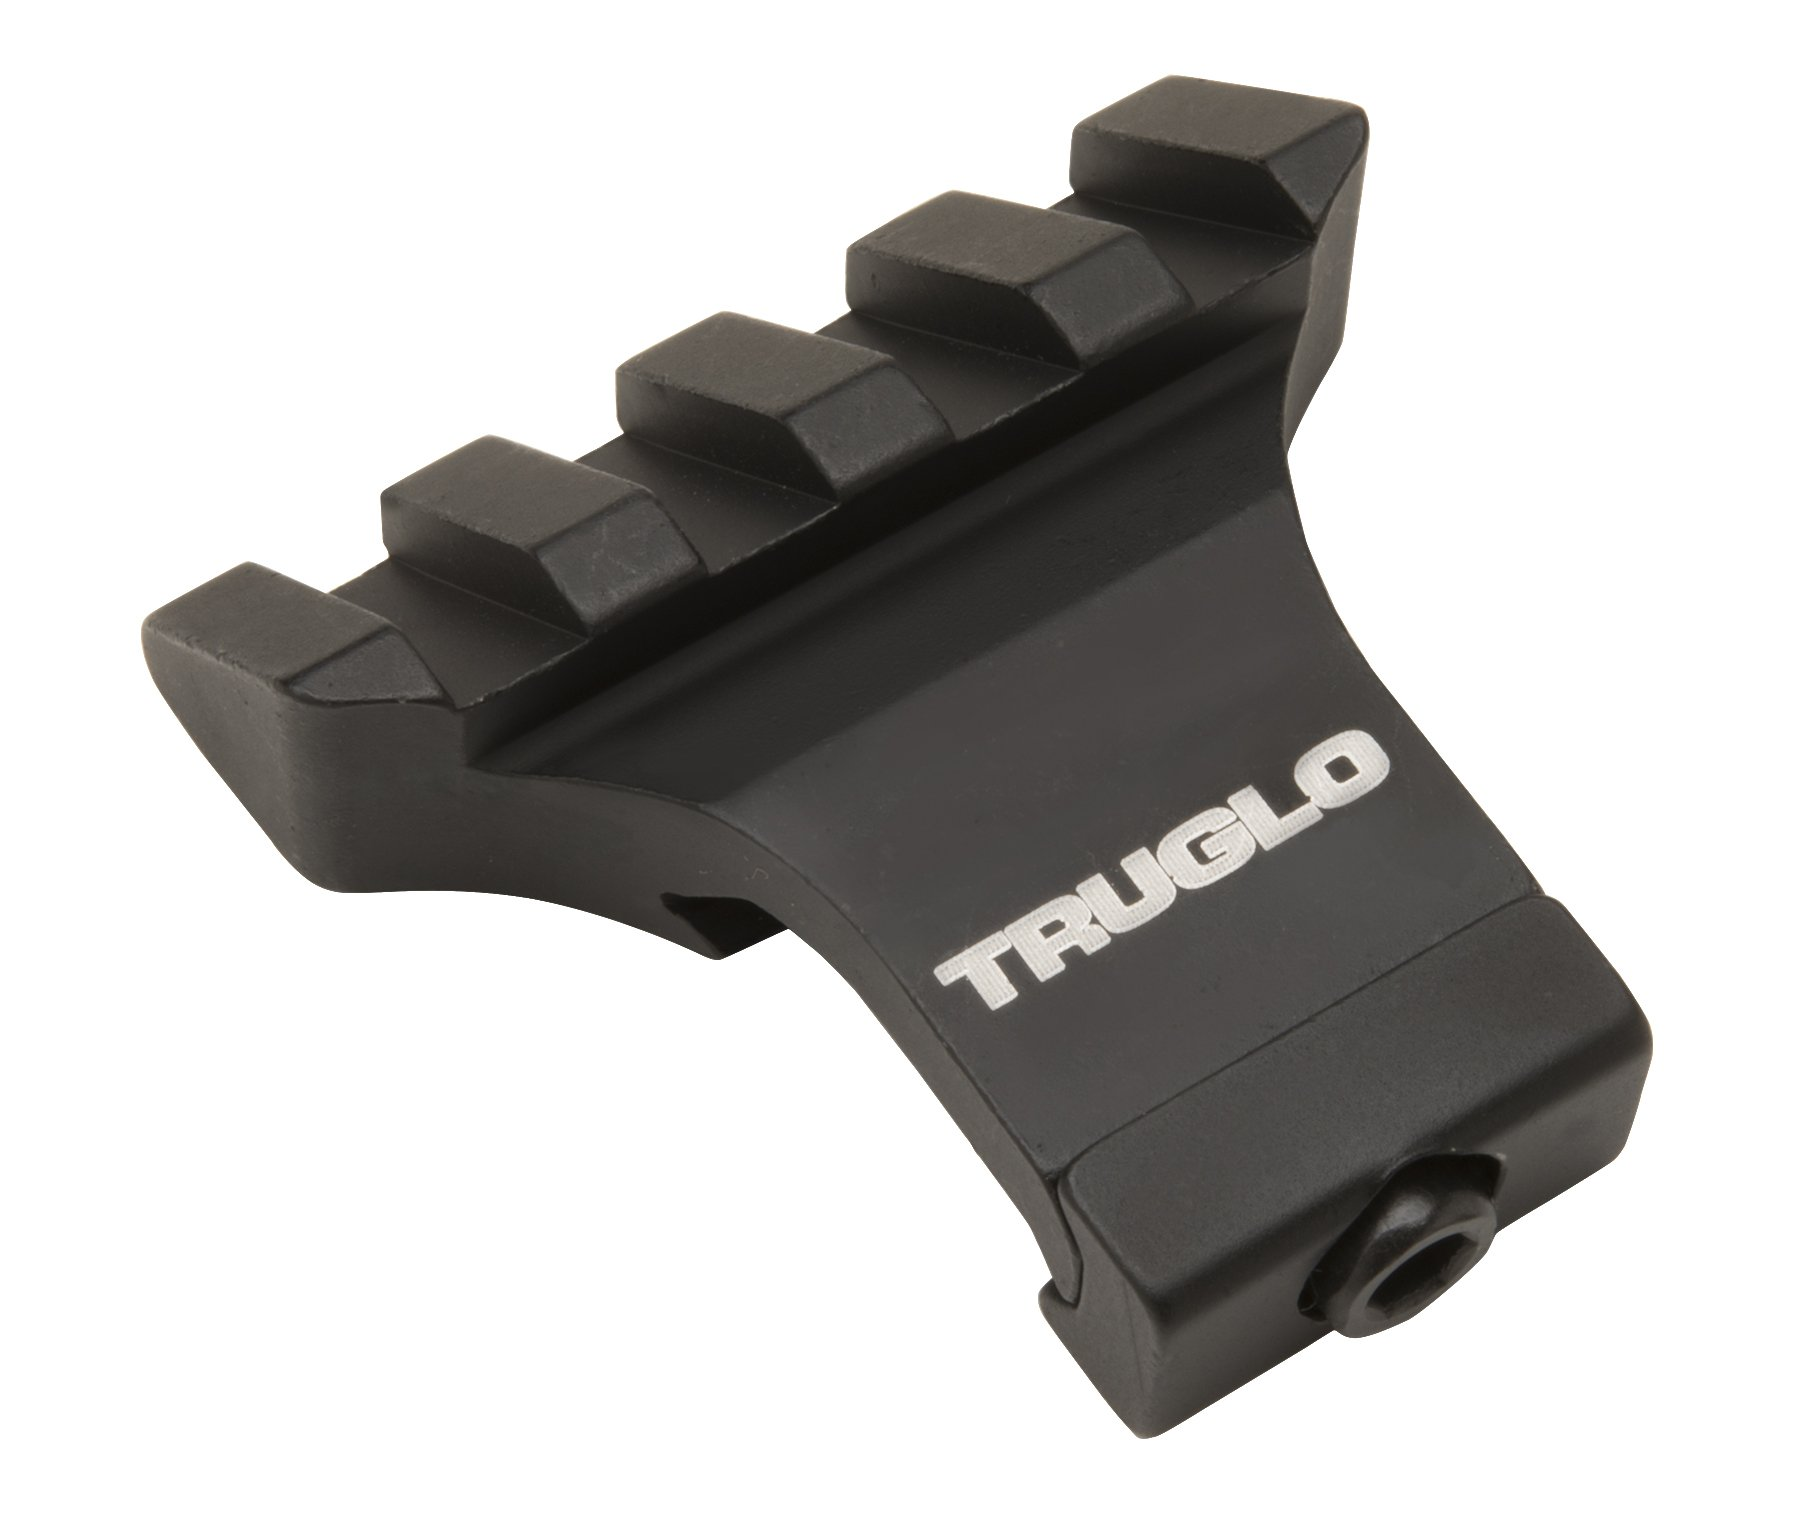 TRUGLO Offset Picatinny Riser Mount for Scopes or Dot Optics